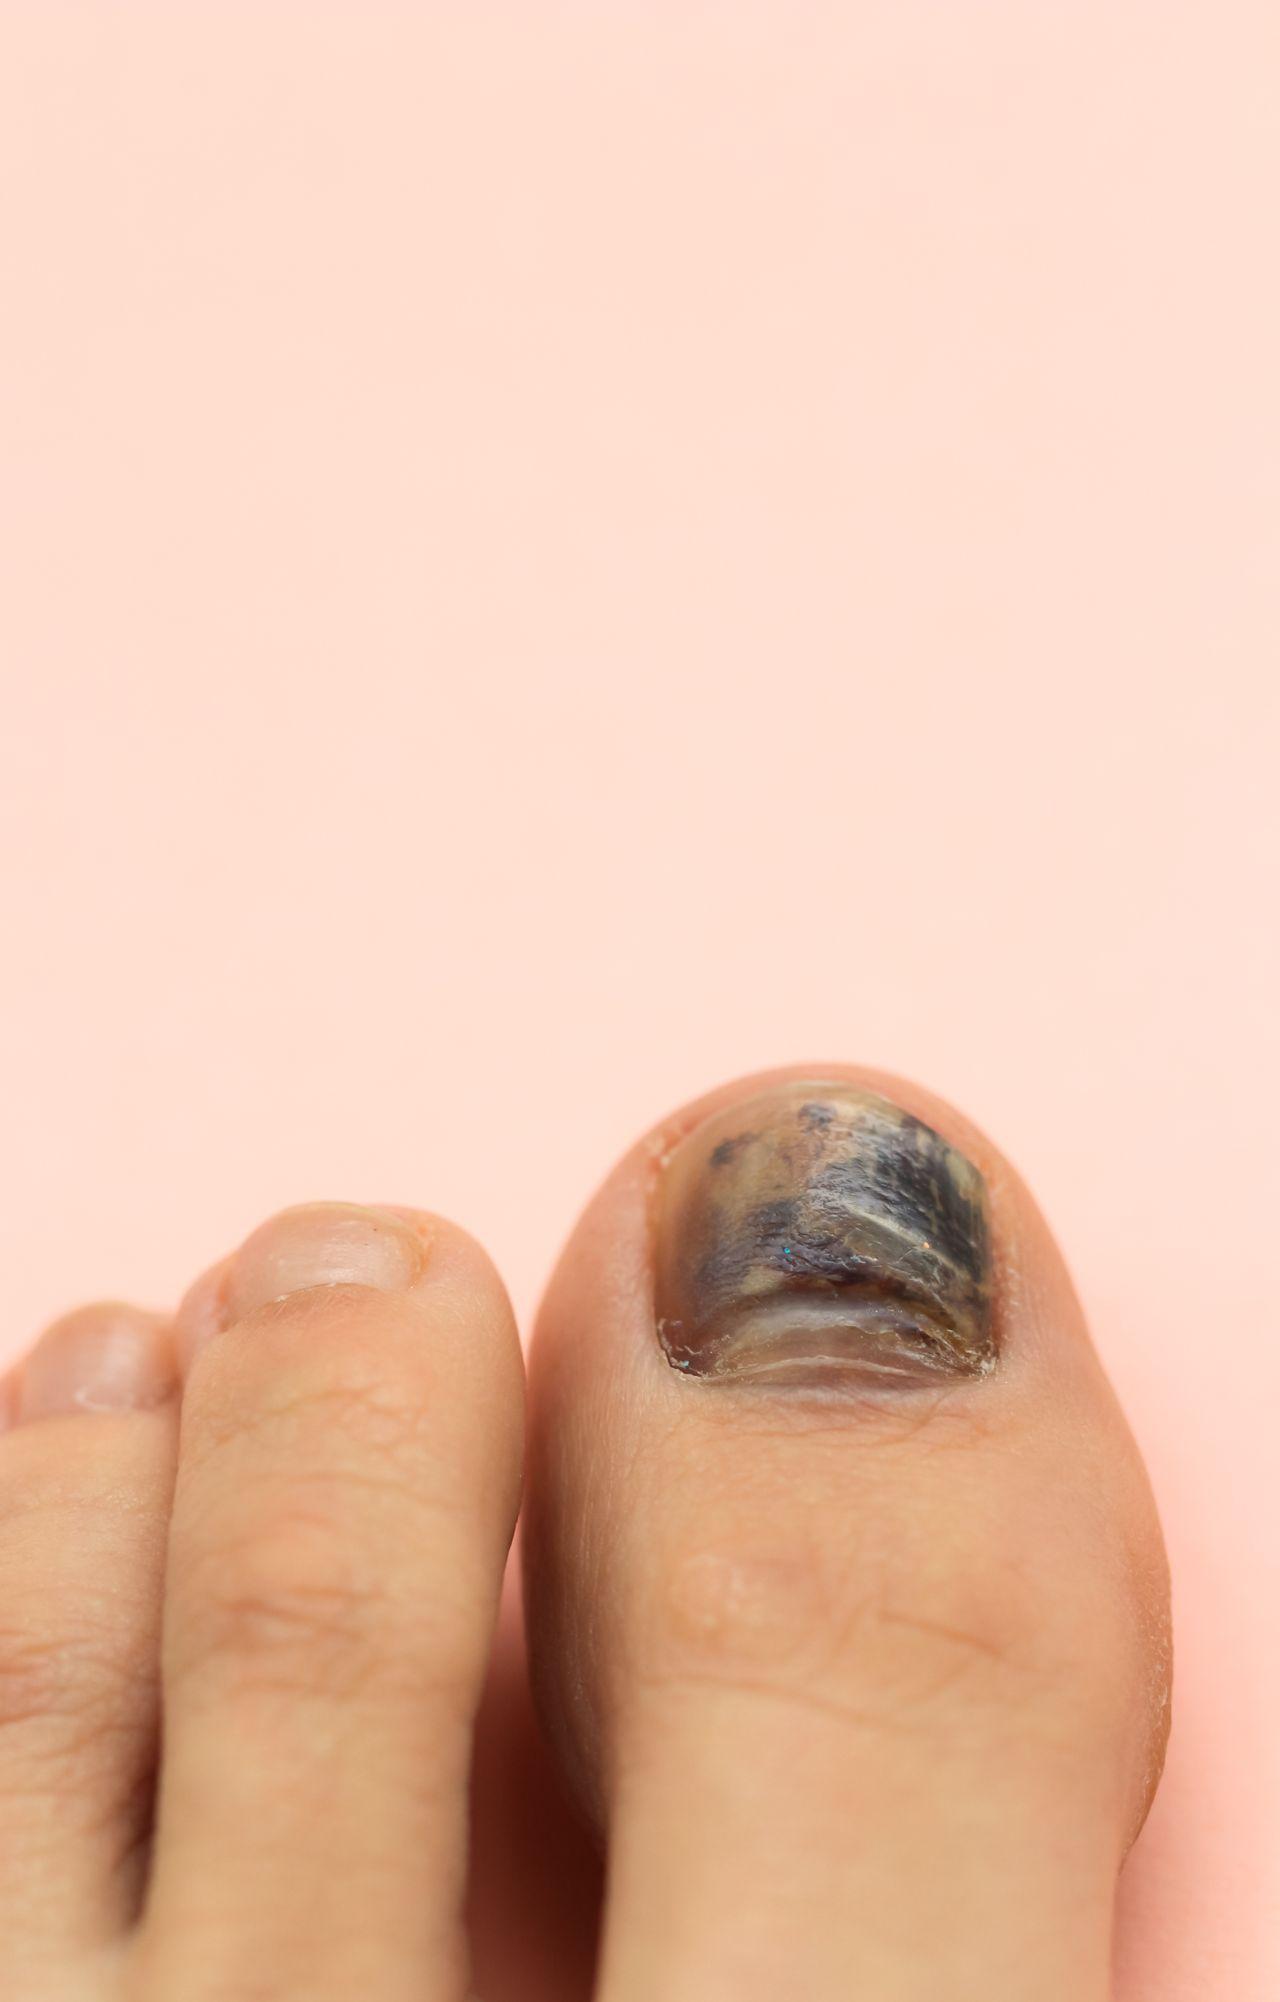 Should I be worried about a dark spot under my toenail? | Prairie ...